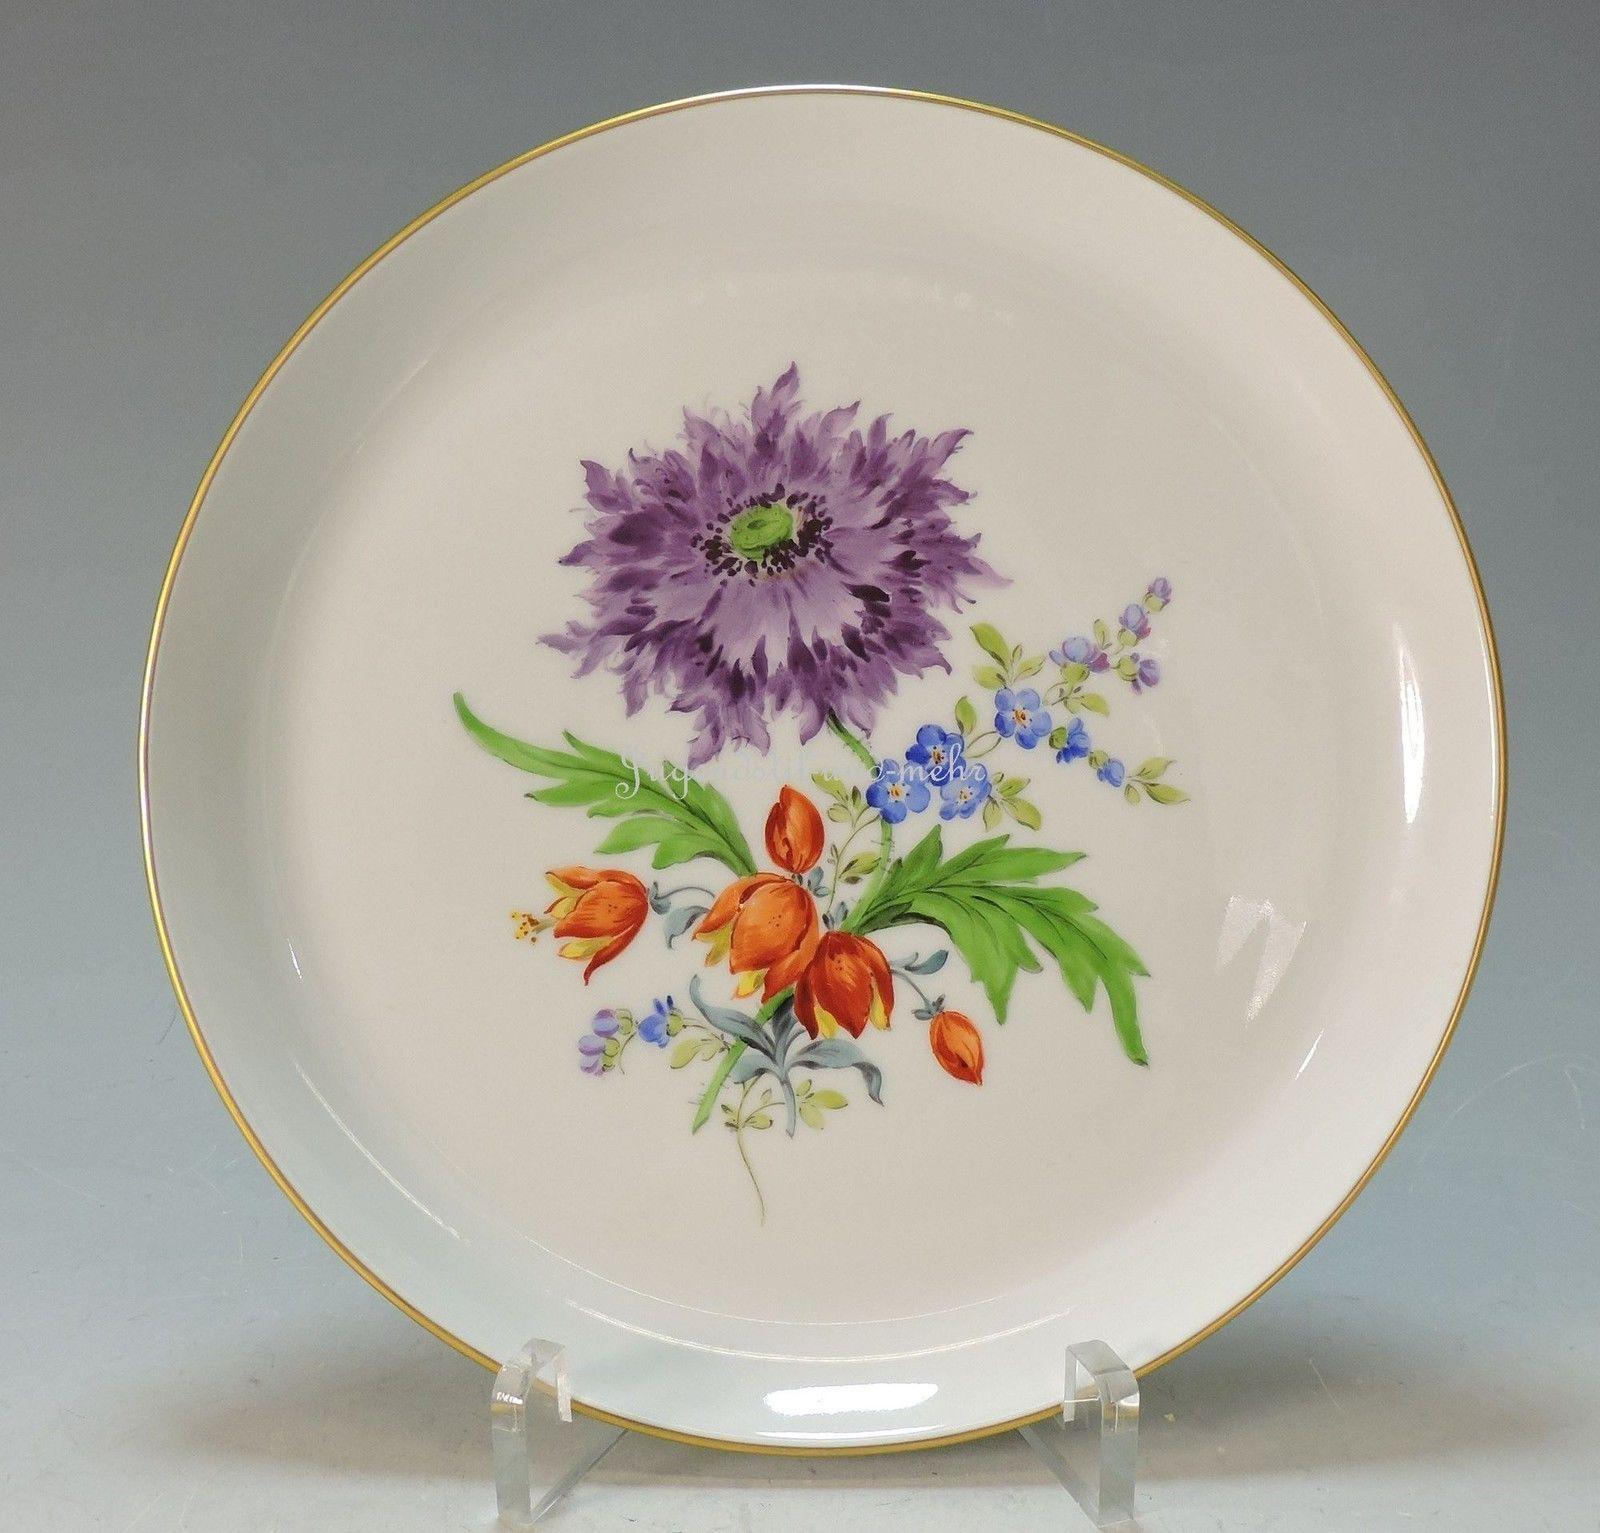 Meissen Keramik: MEISSEN Wunderschöner Wandteller Große Blumenmalerei -1